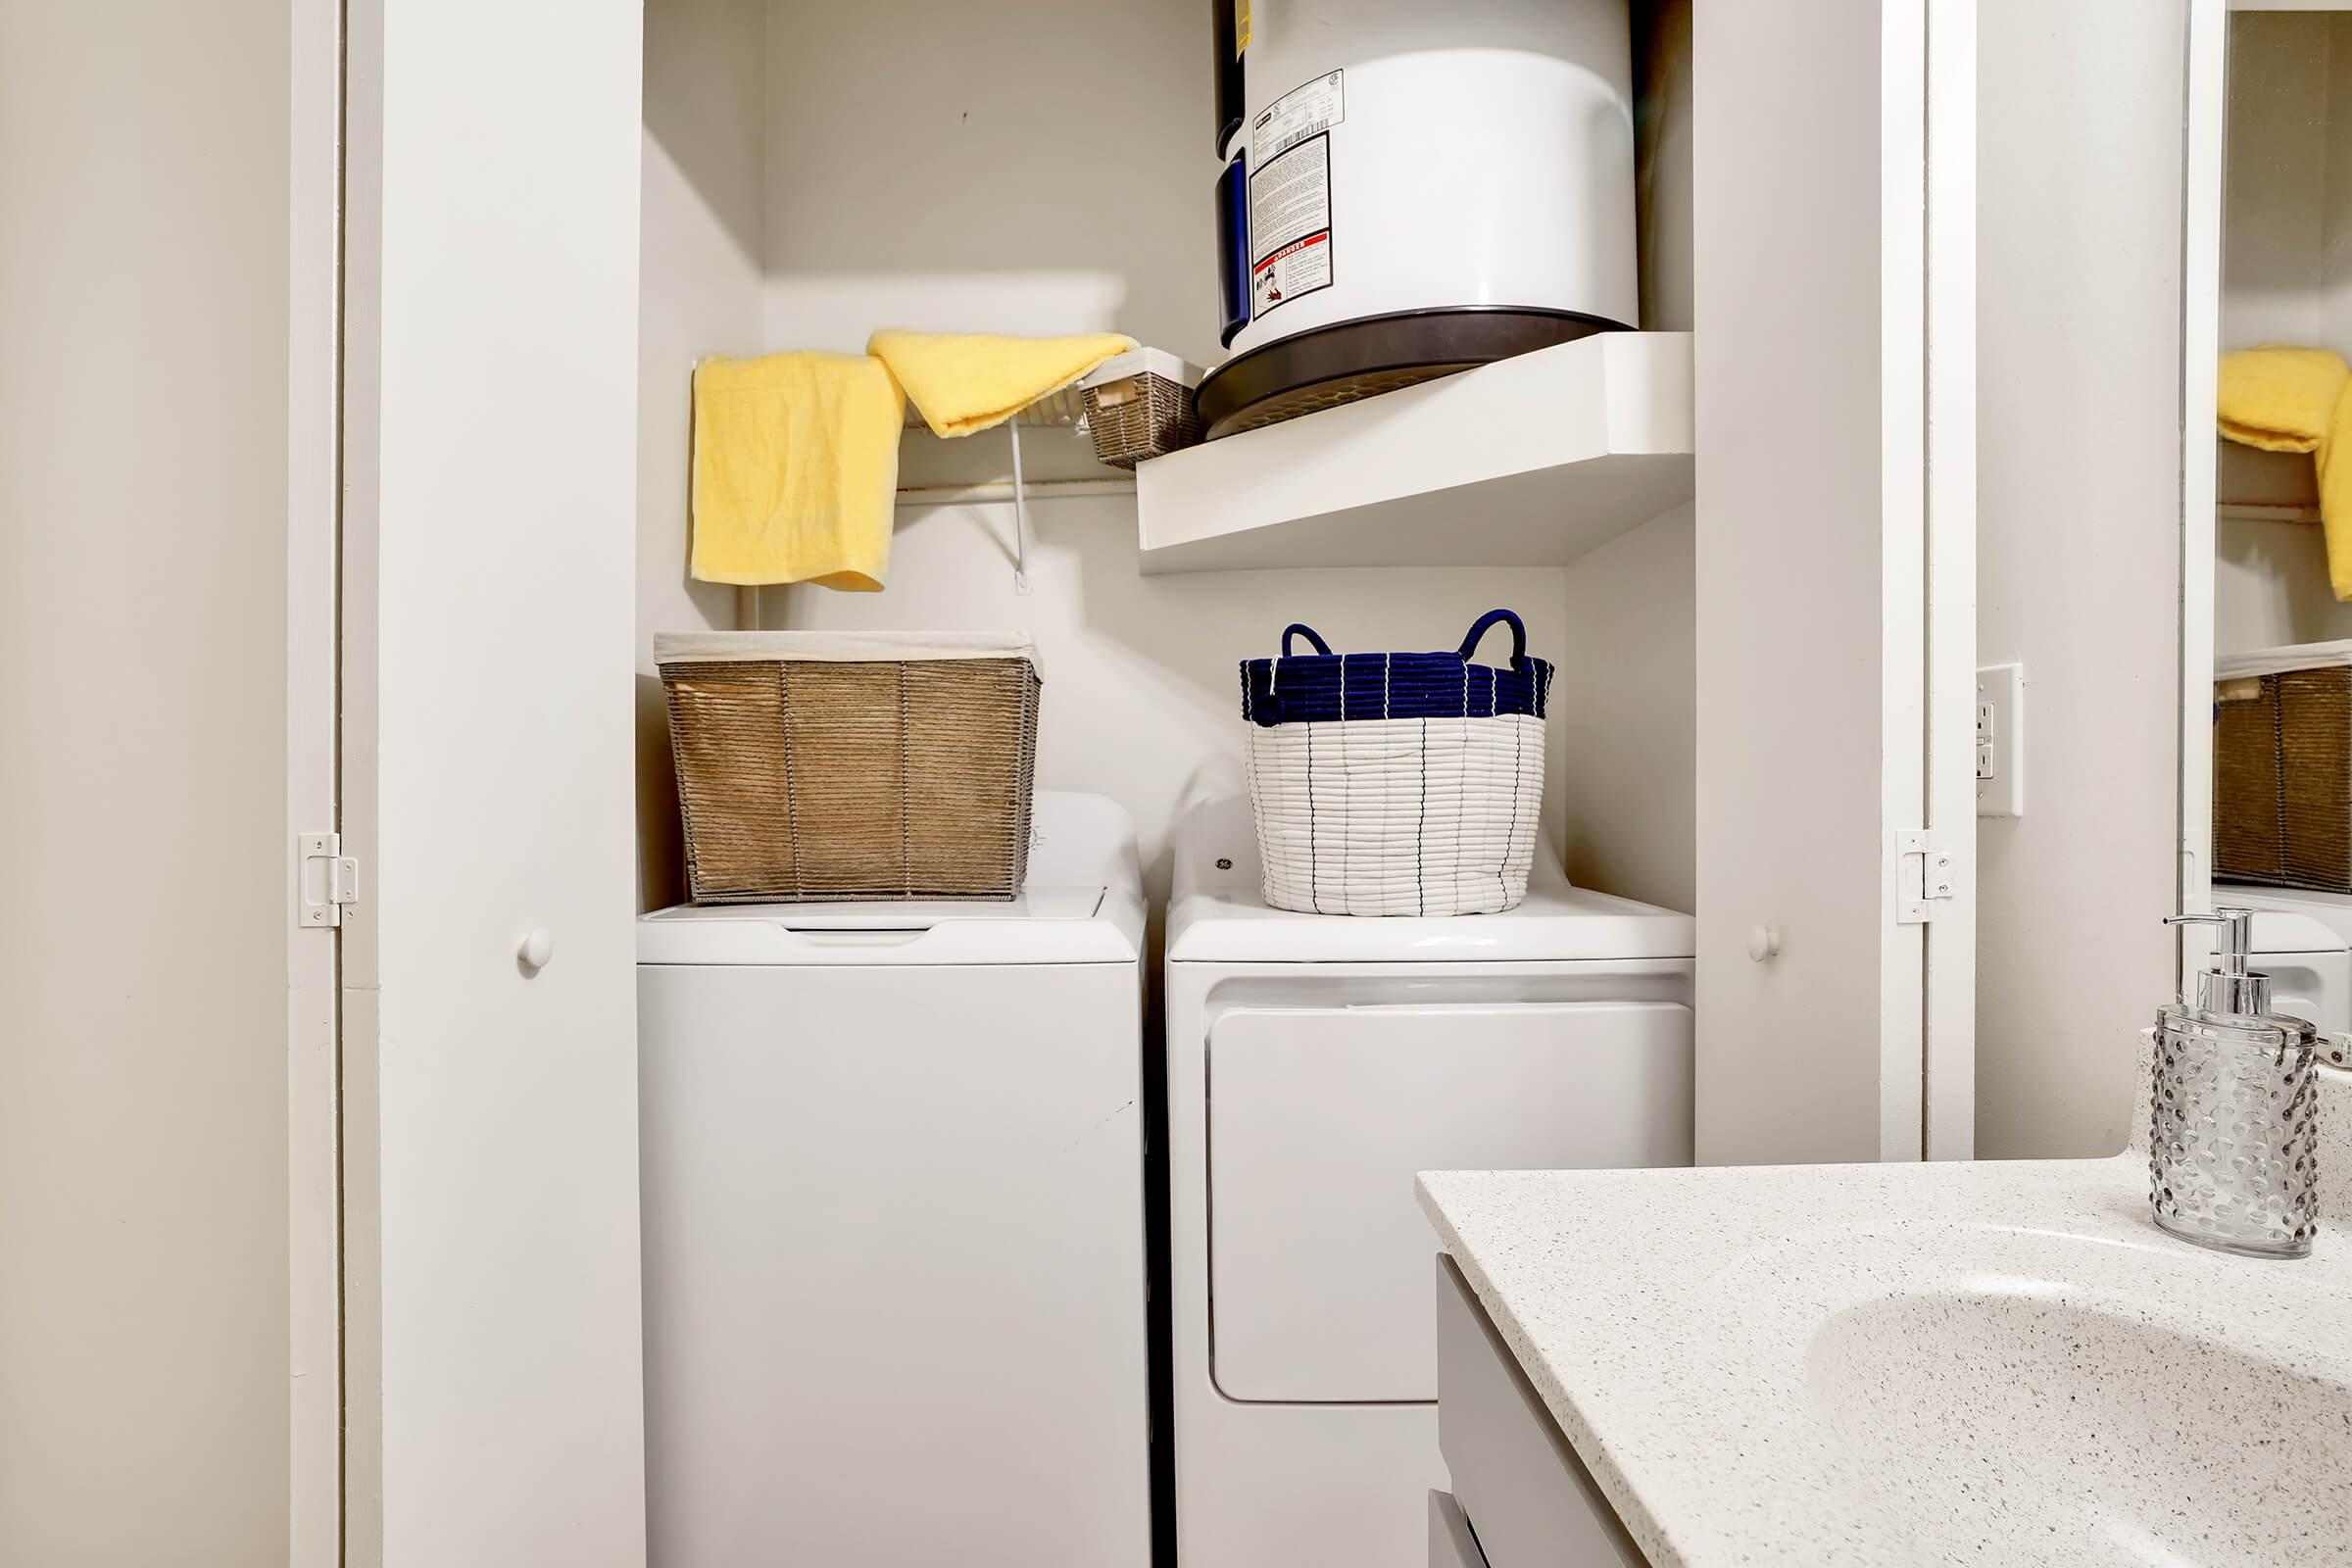 a white refrigerator freezer sitting next to a sink